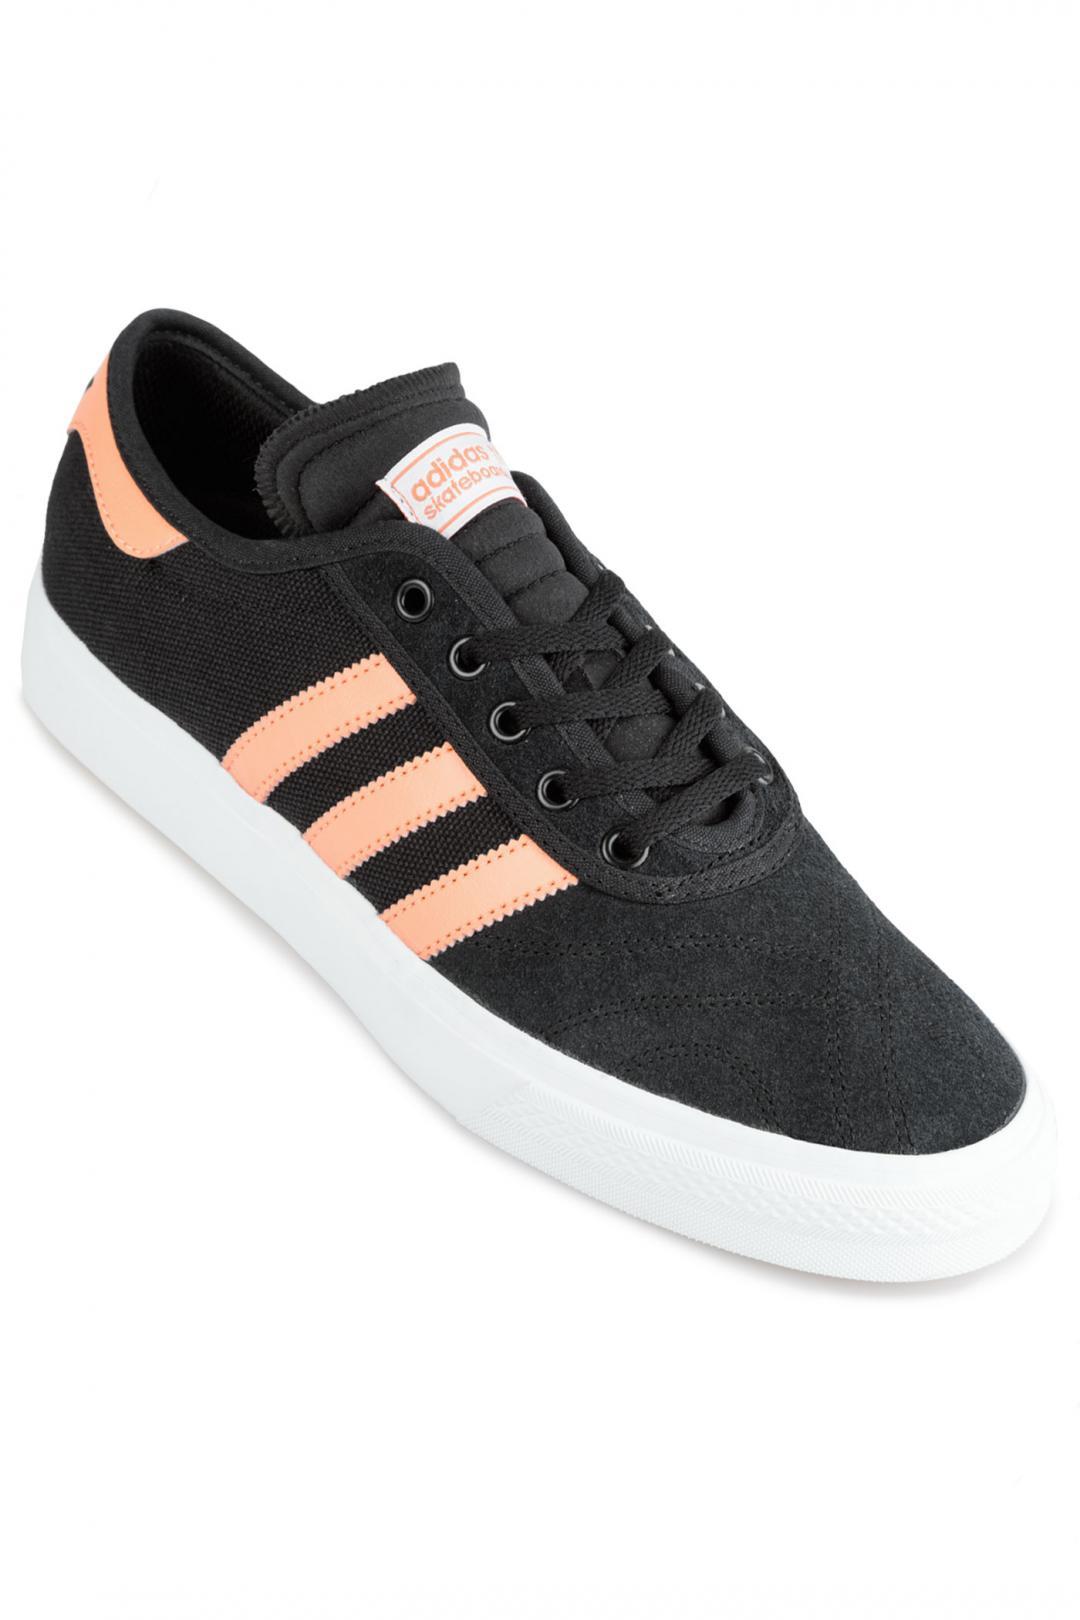 Uomo adidas Skateboarding Adi Ease Premiere core black chalk coral | Sneaker